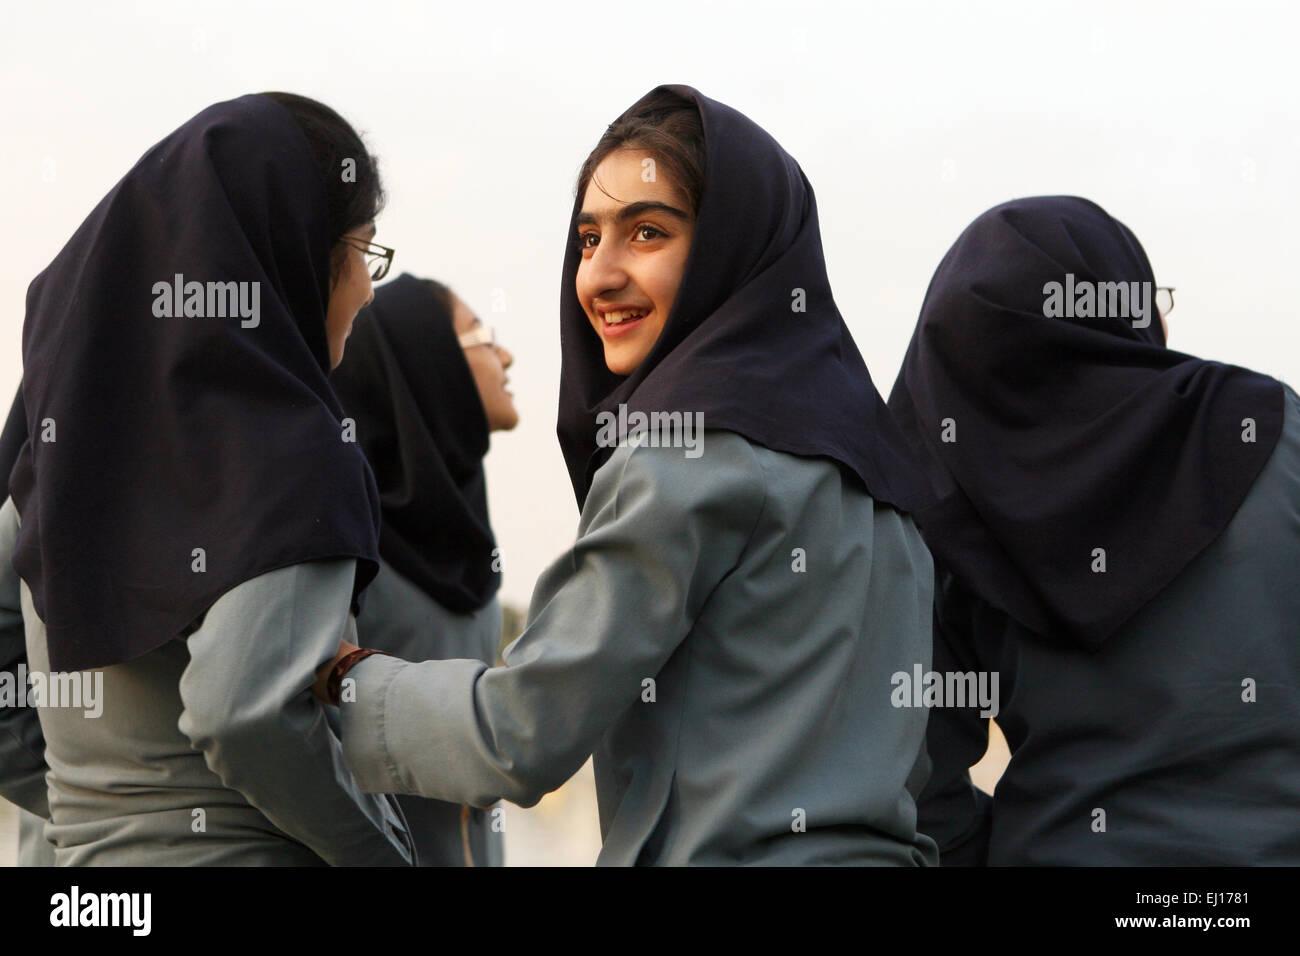 Los alumnos en Teherán, Irán. Imagen De Stock